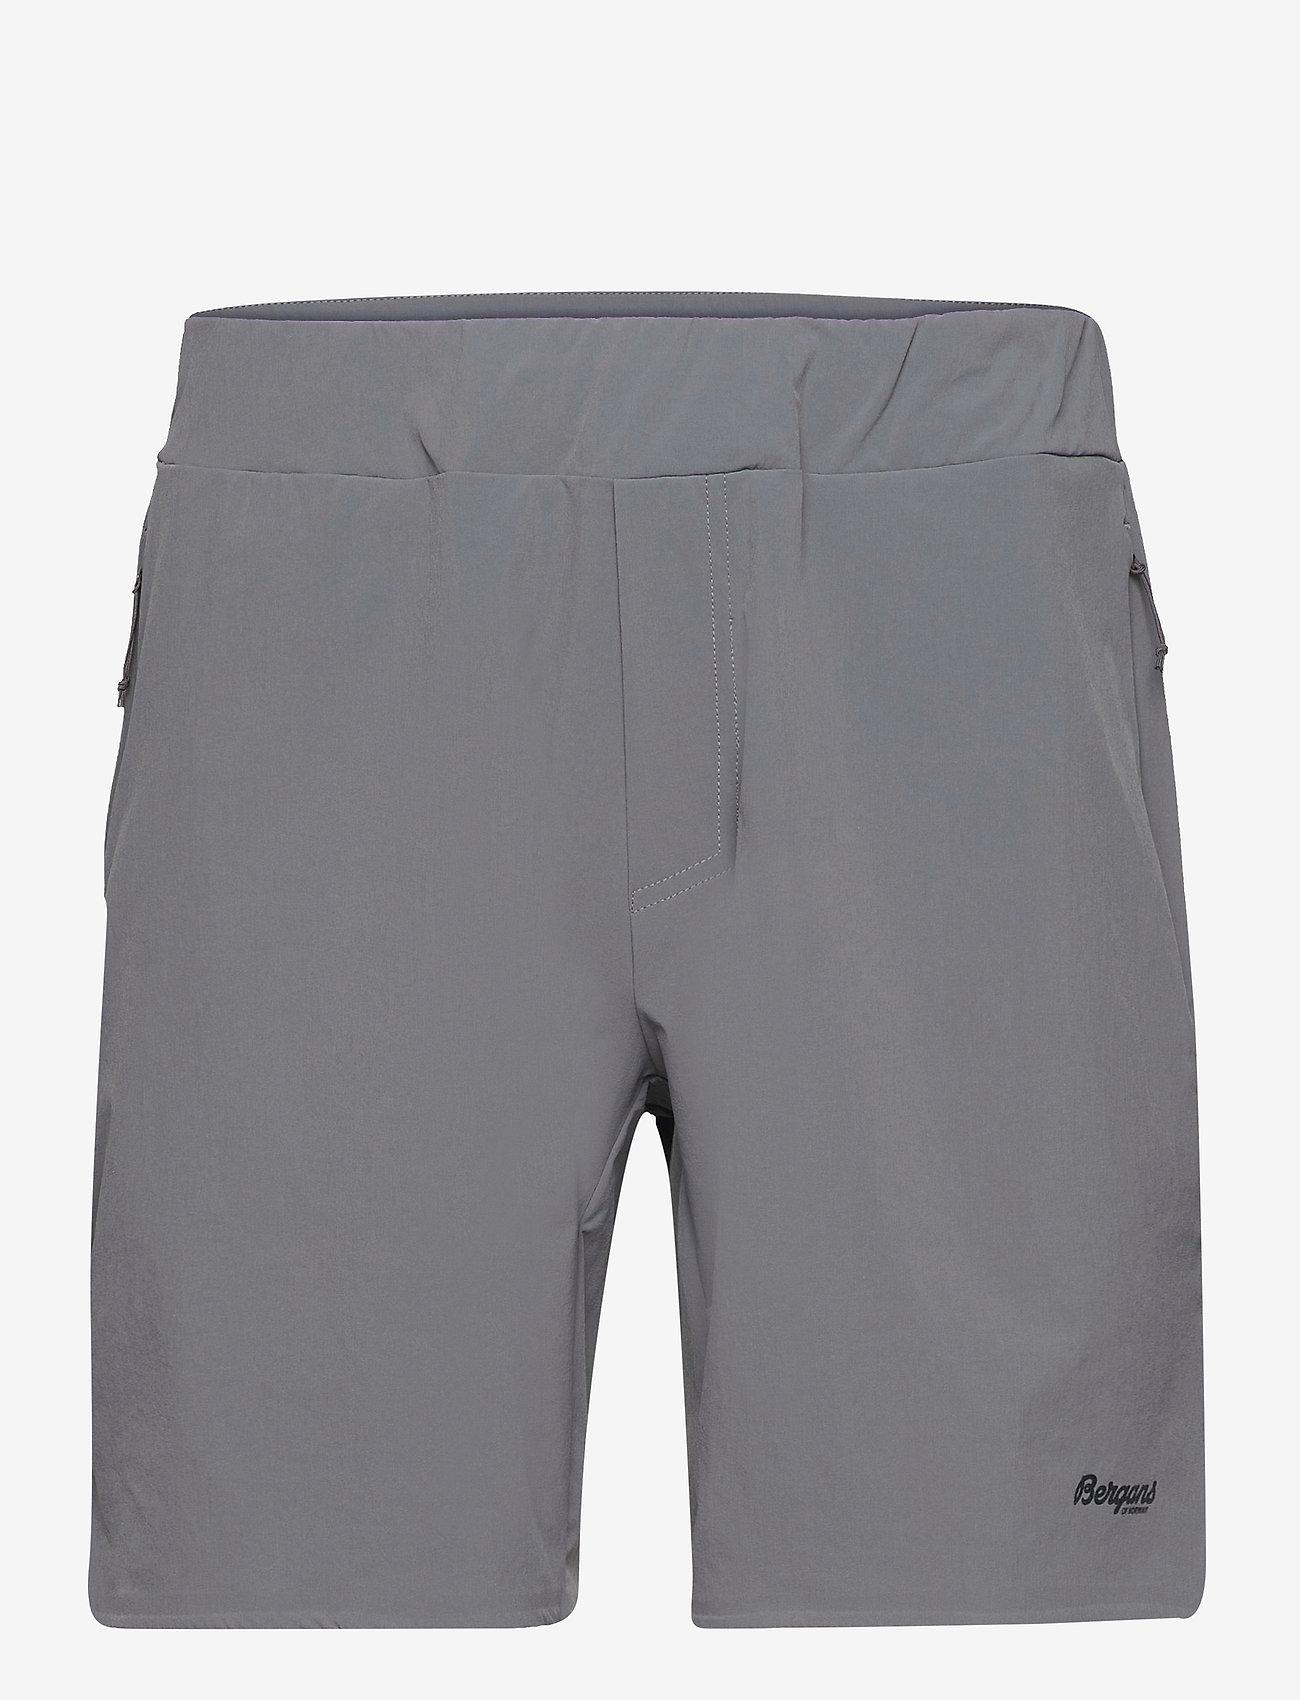 Bergans - Flyen V2 Shorts - wandel korte broek - solid dark grey - 0